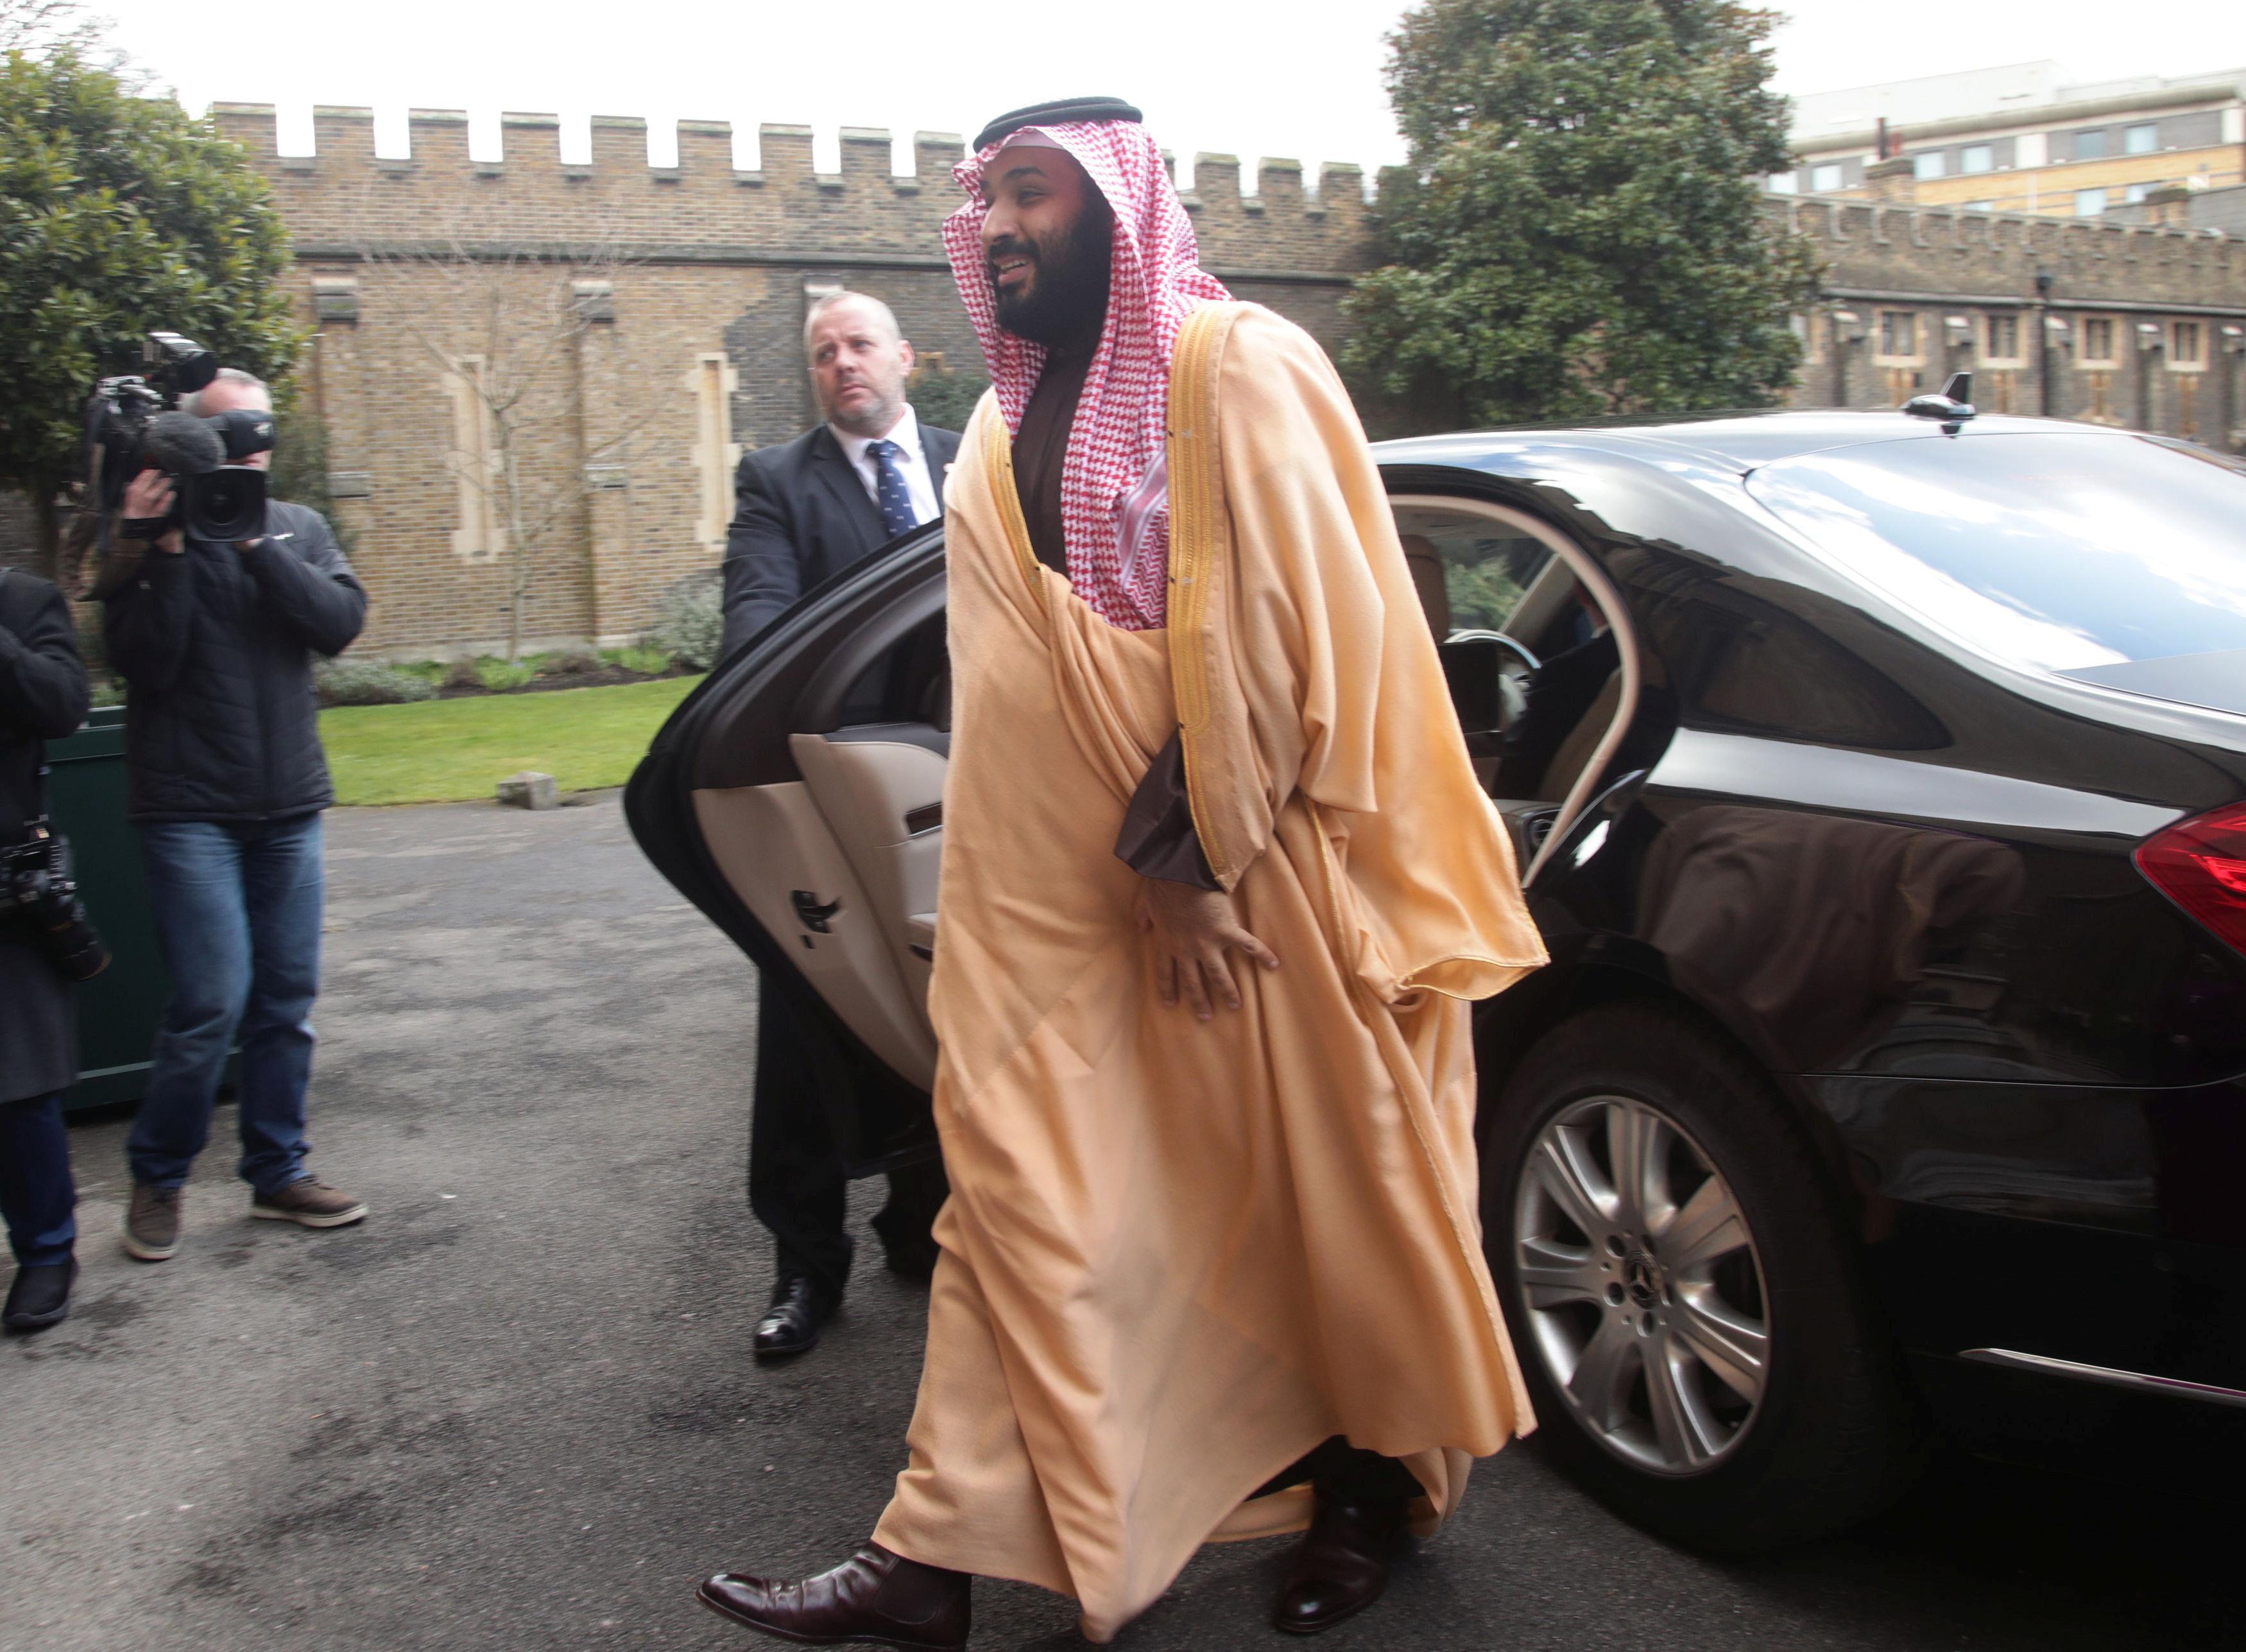 FILE PHOTO: The Crown Prince of Saudi Arabia Mohammed bin Salman arrives at Lambeth Palace, London, Britain, March 8, 2018. REUTERS/Yui Mok/Pool